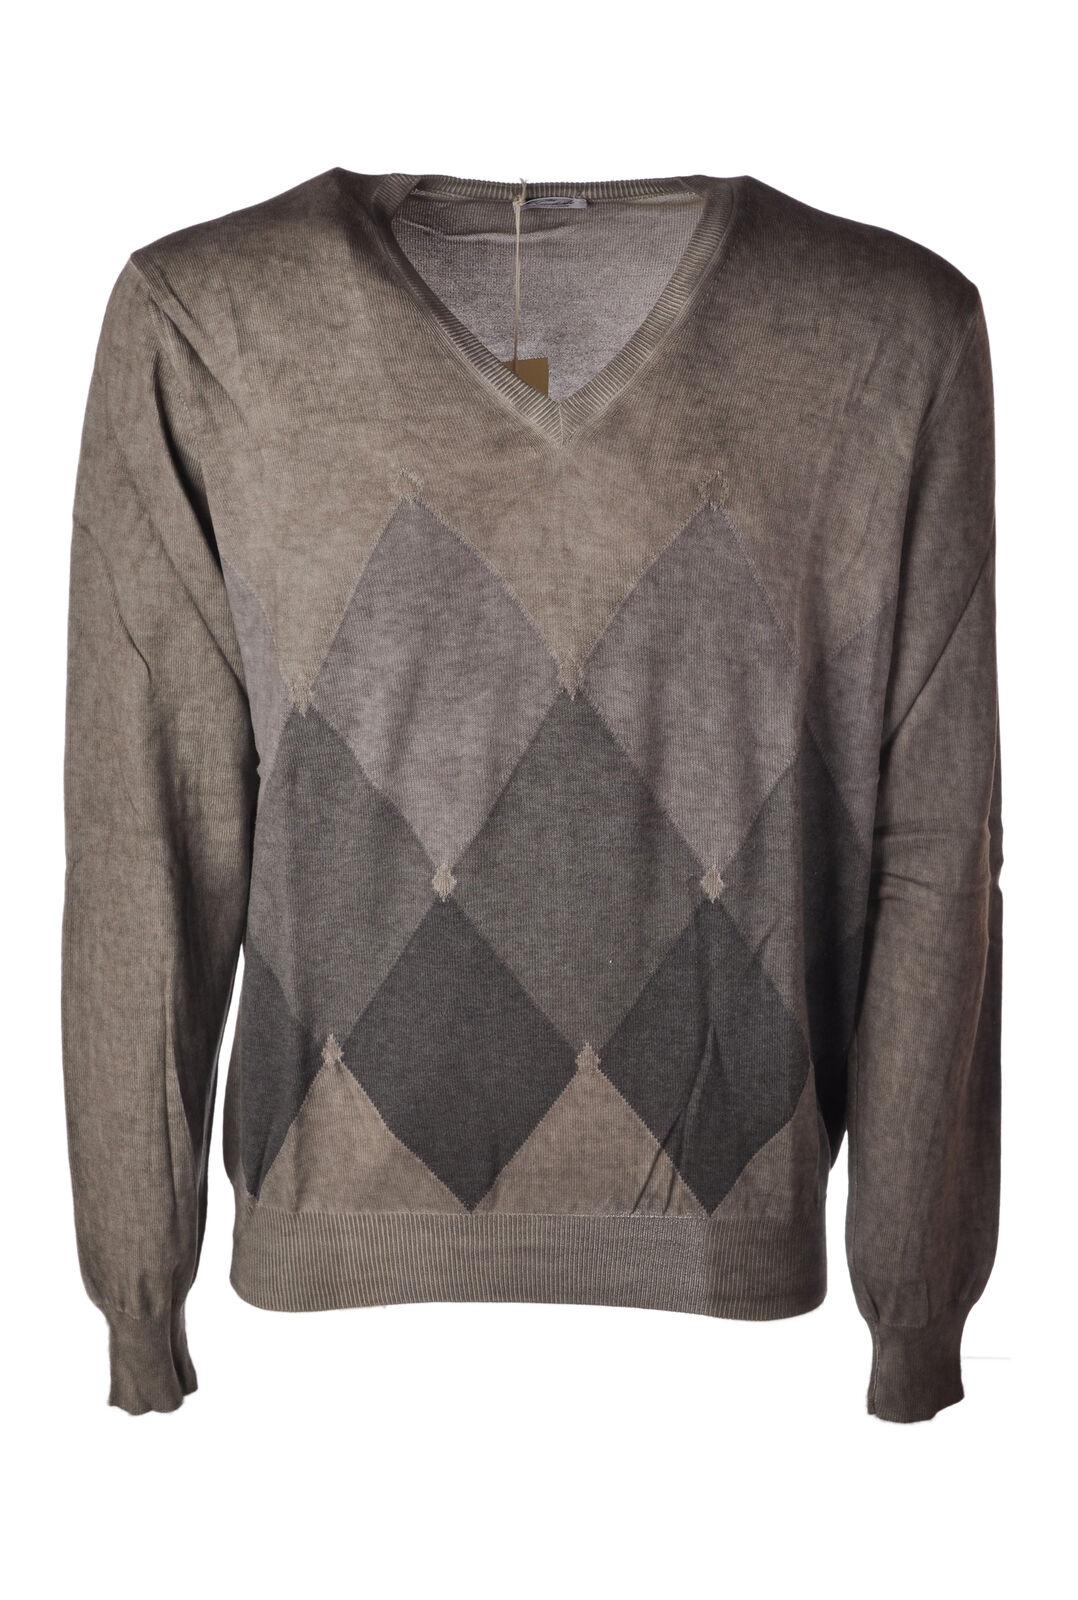 Viadeste  -  Sweaters - Male - Grey - 4667221A185837